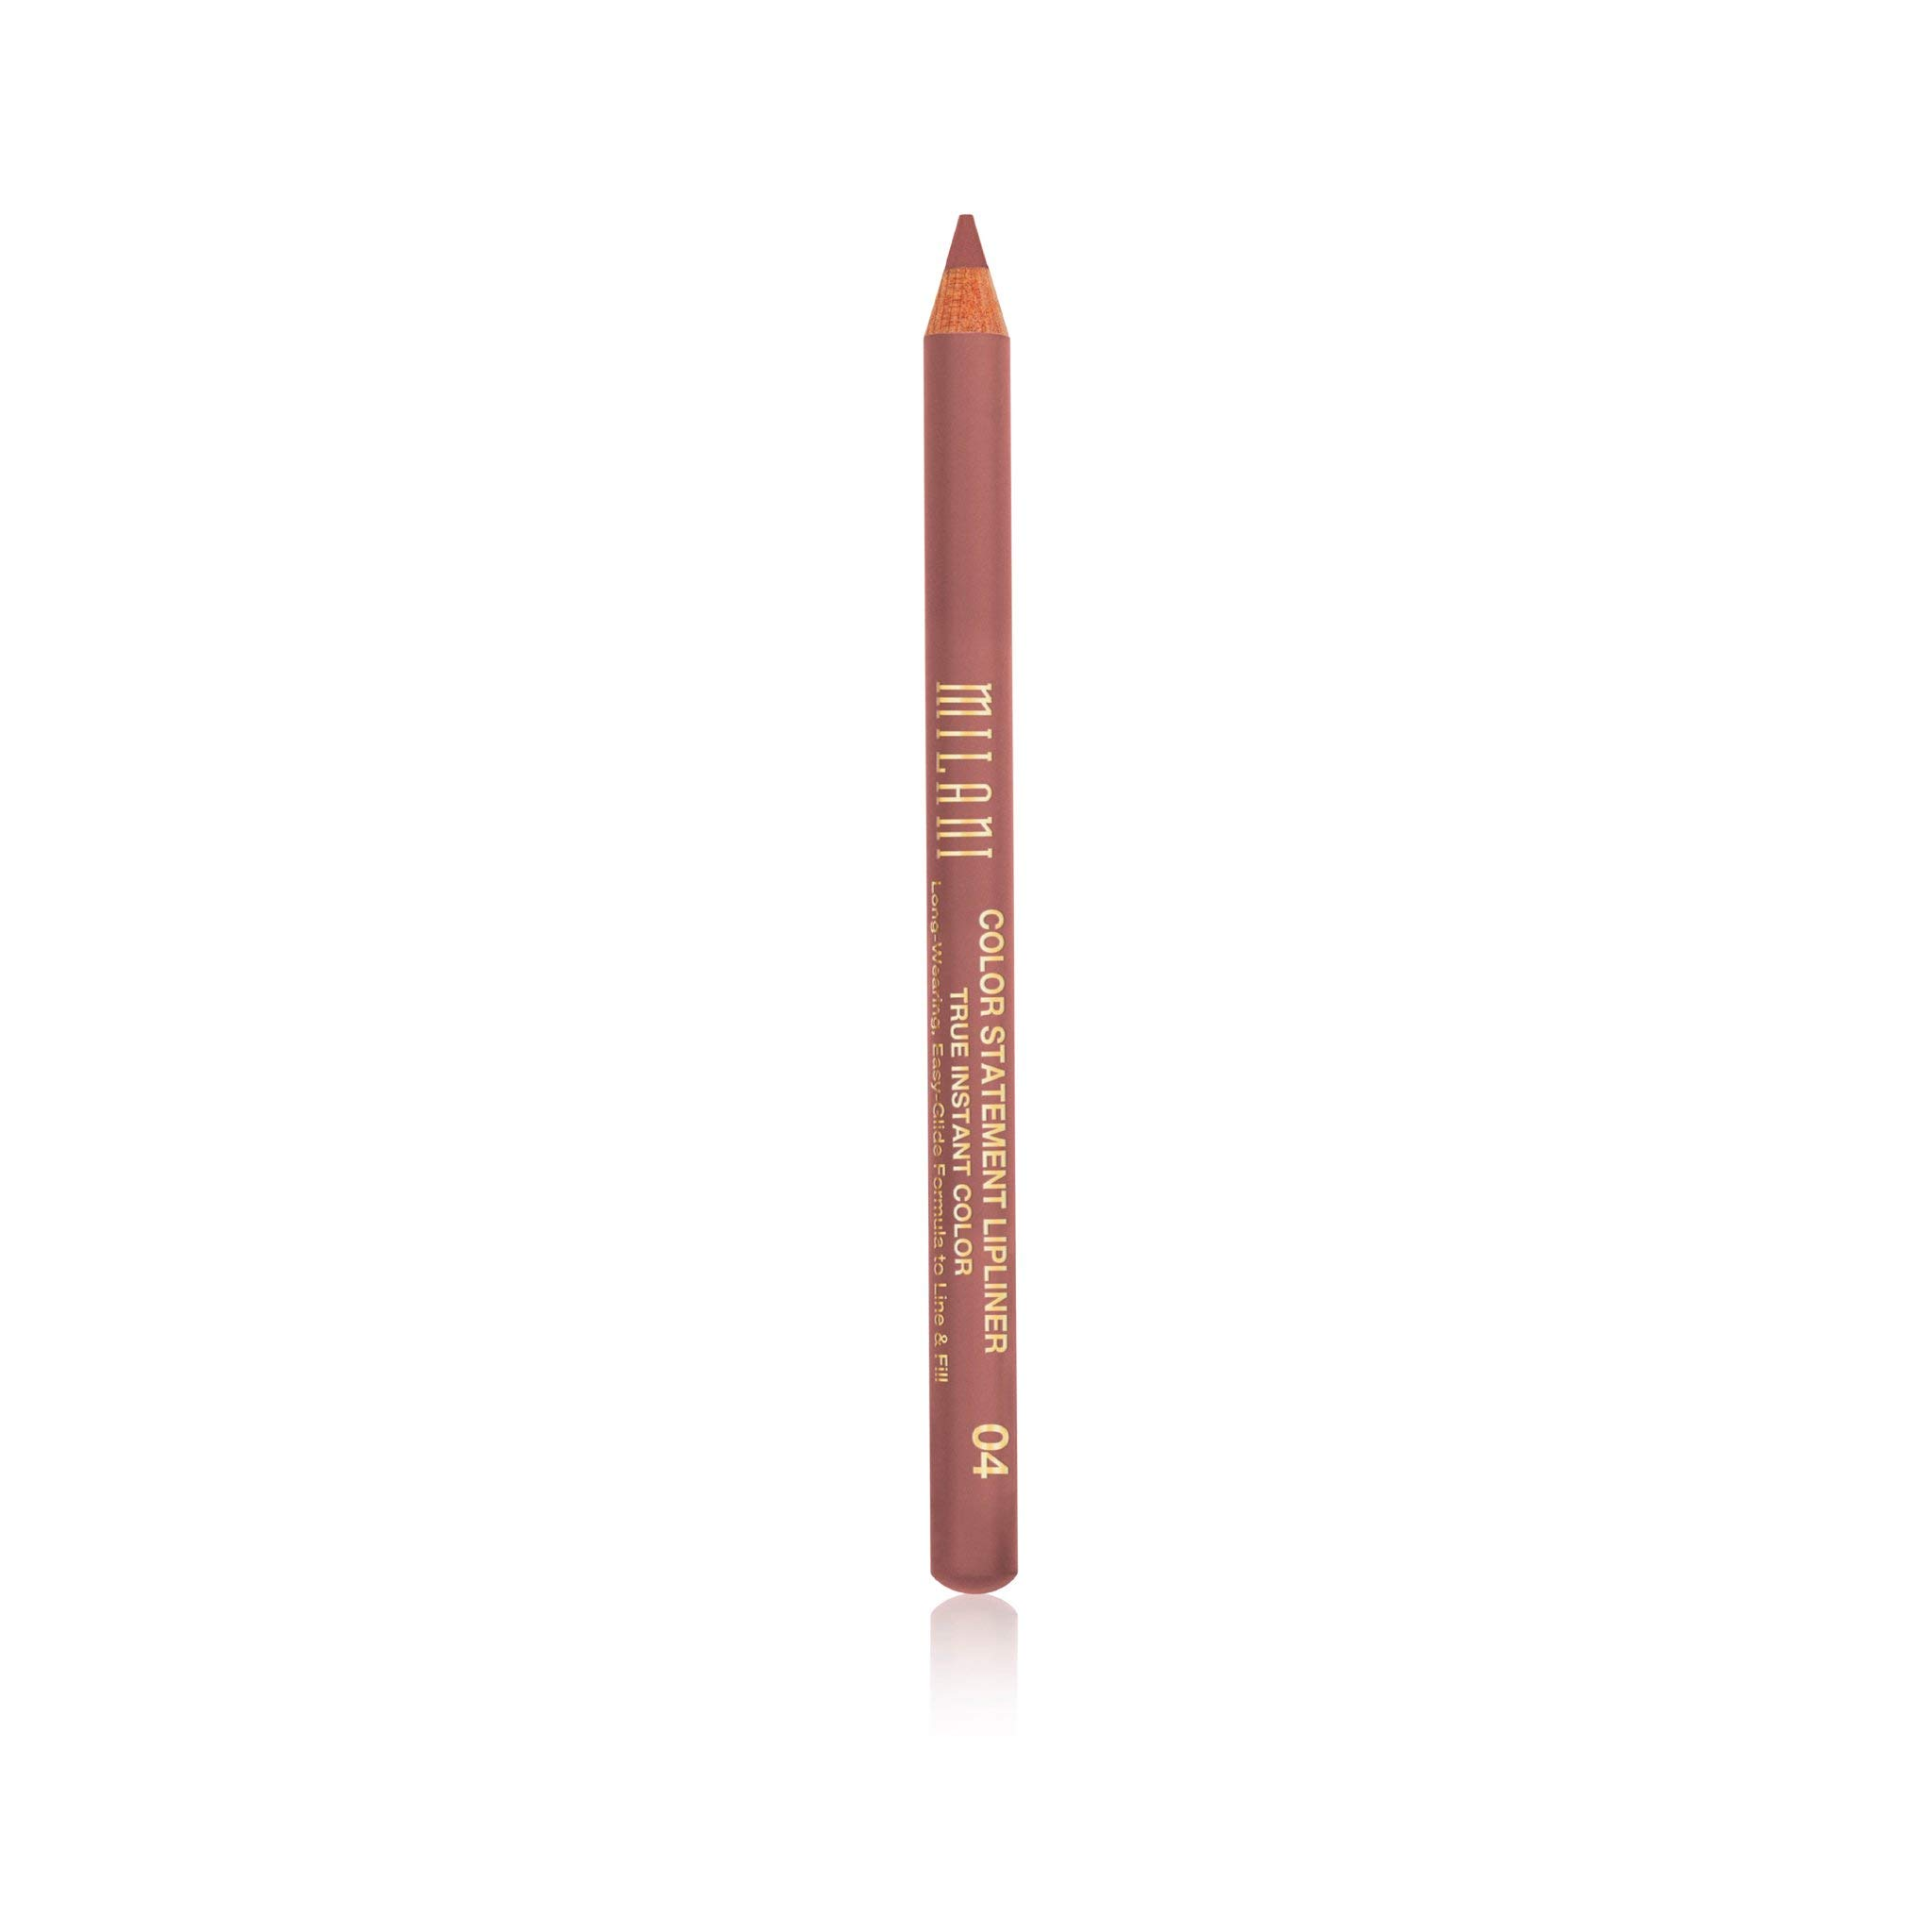 Milani Color Statement Lipliner - All Natural (0.04 Ounce) Cruelty-Free Lip Pencil to Define, Shape & Fill Lips